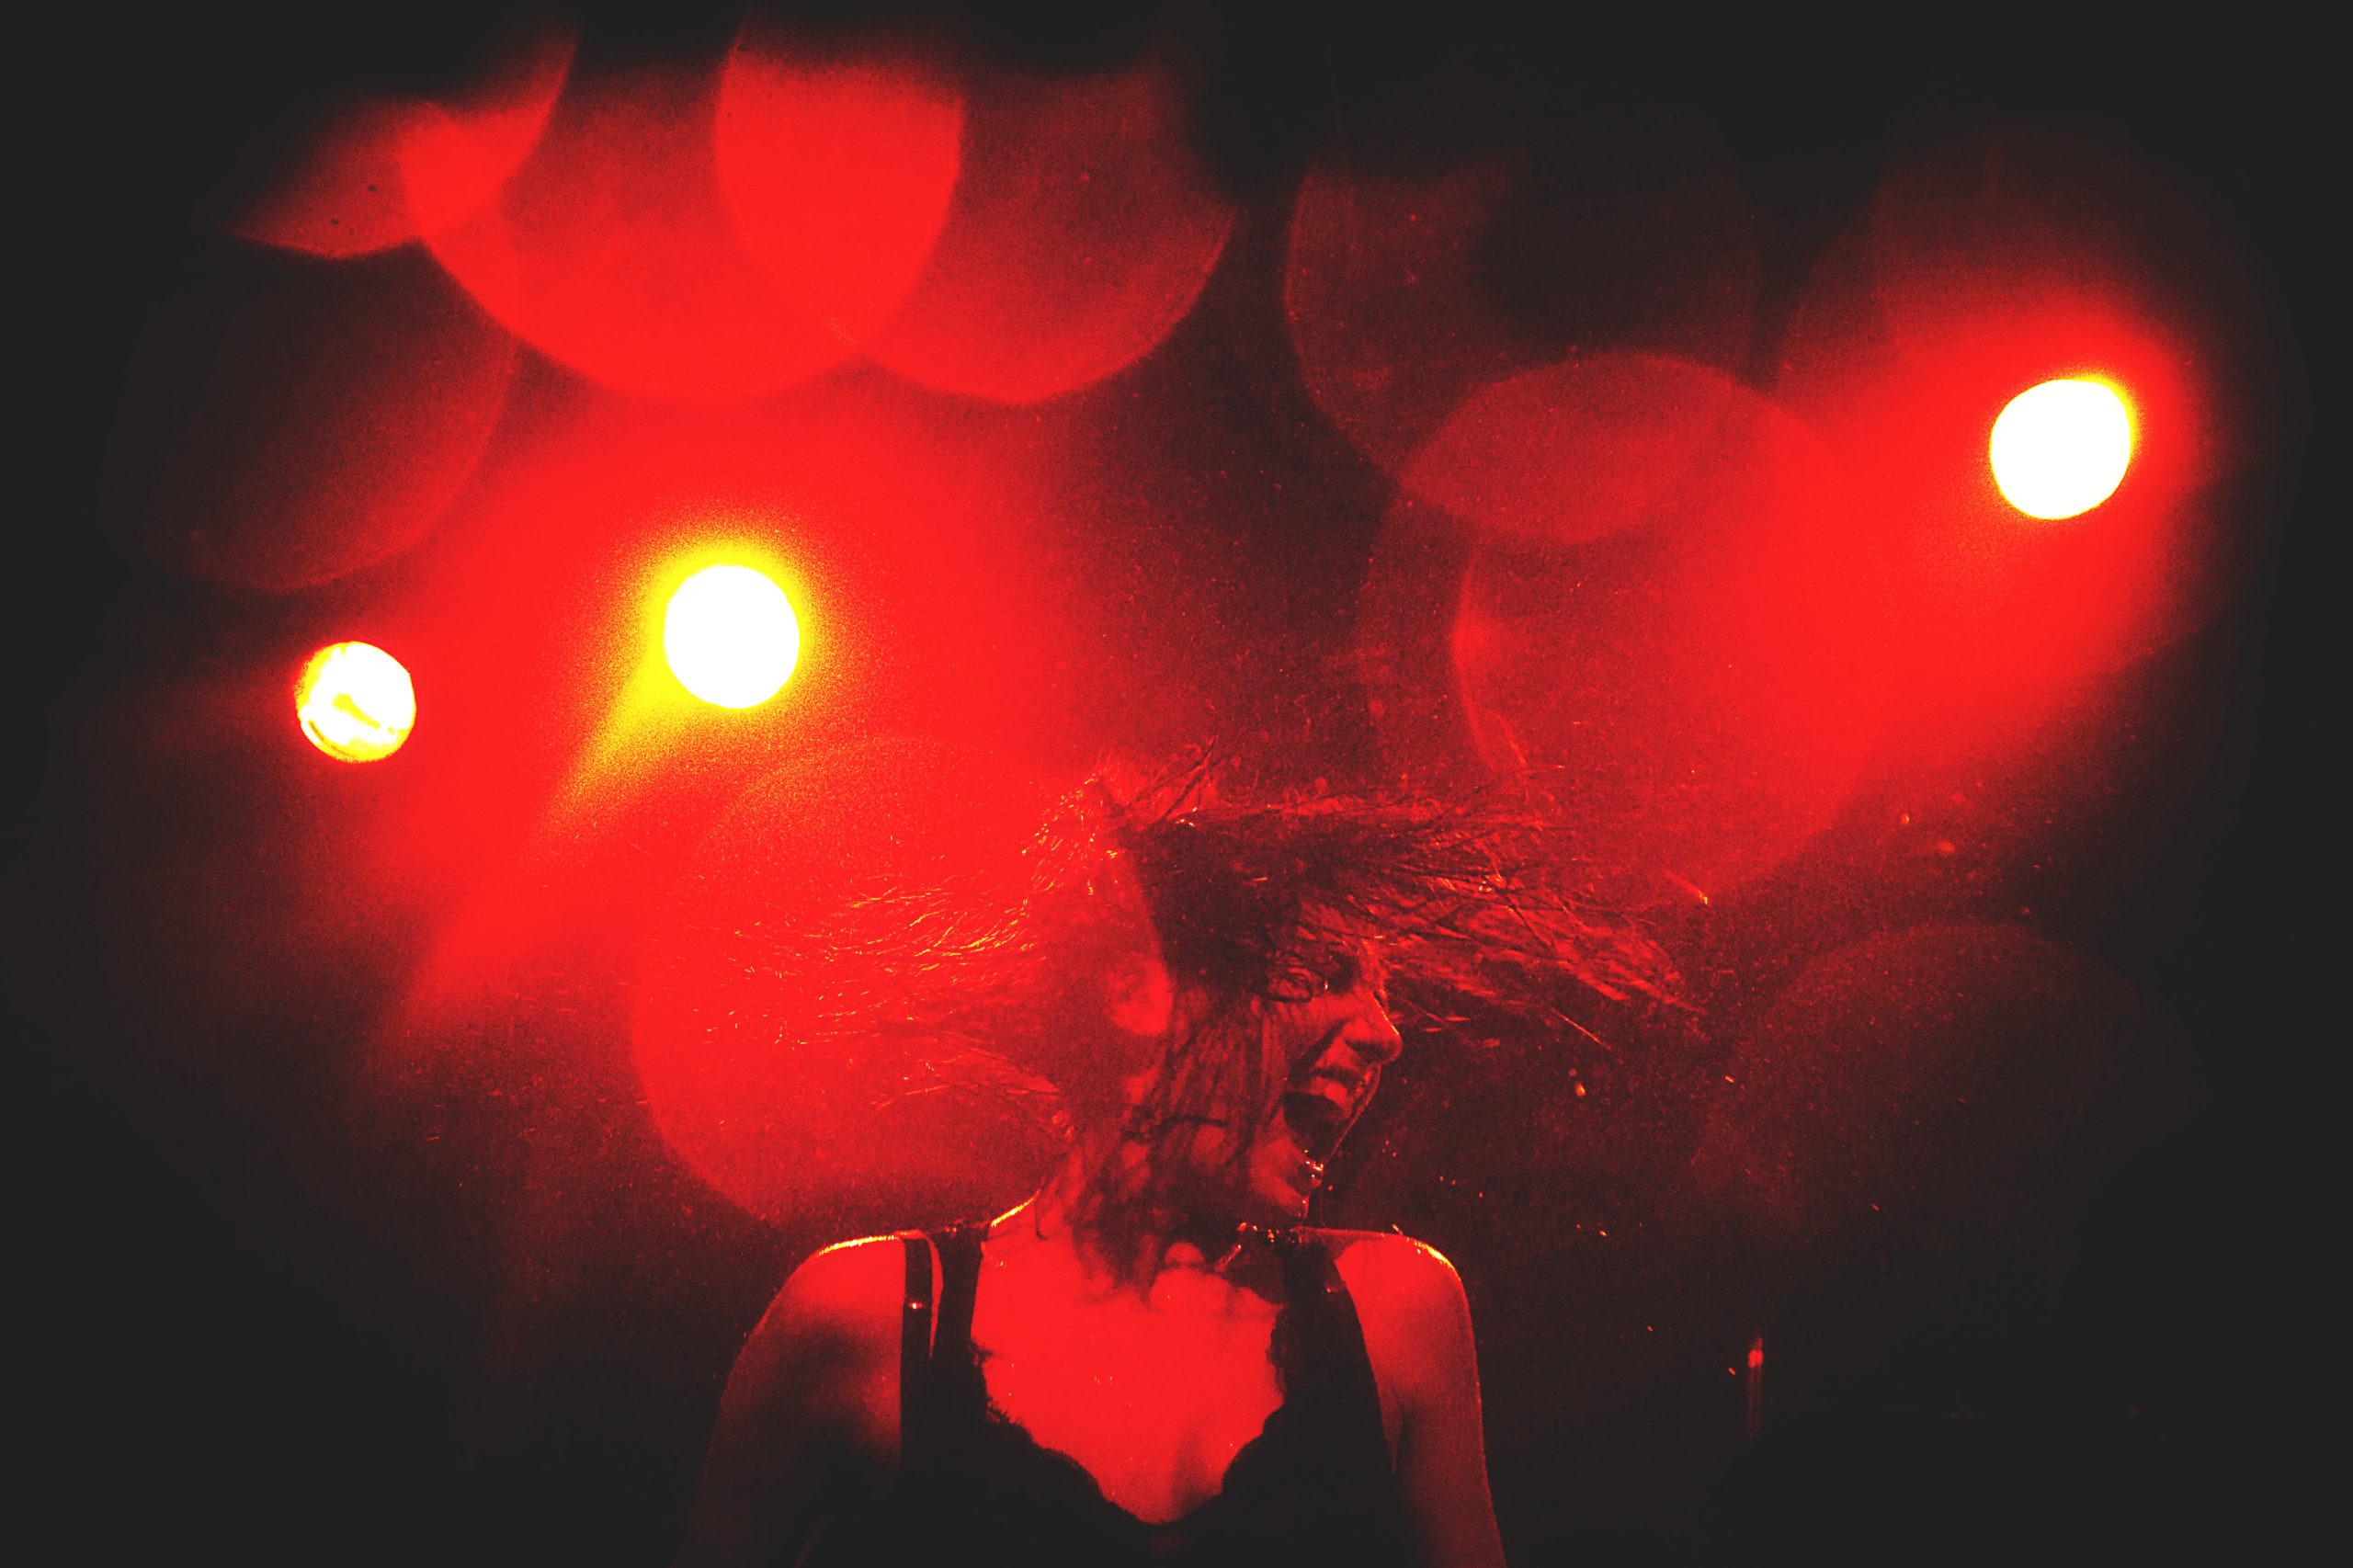 Photo Concert : Izia - EMB, Sannois - 2010  | ©Rod Maurice